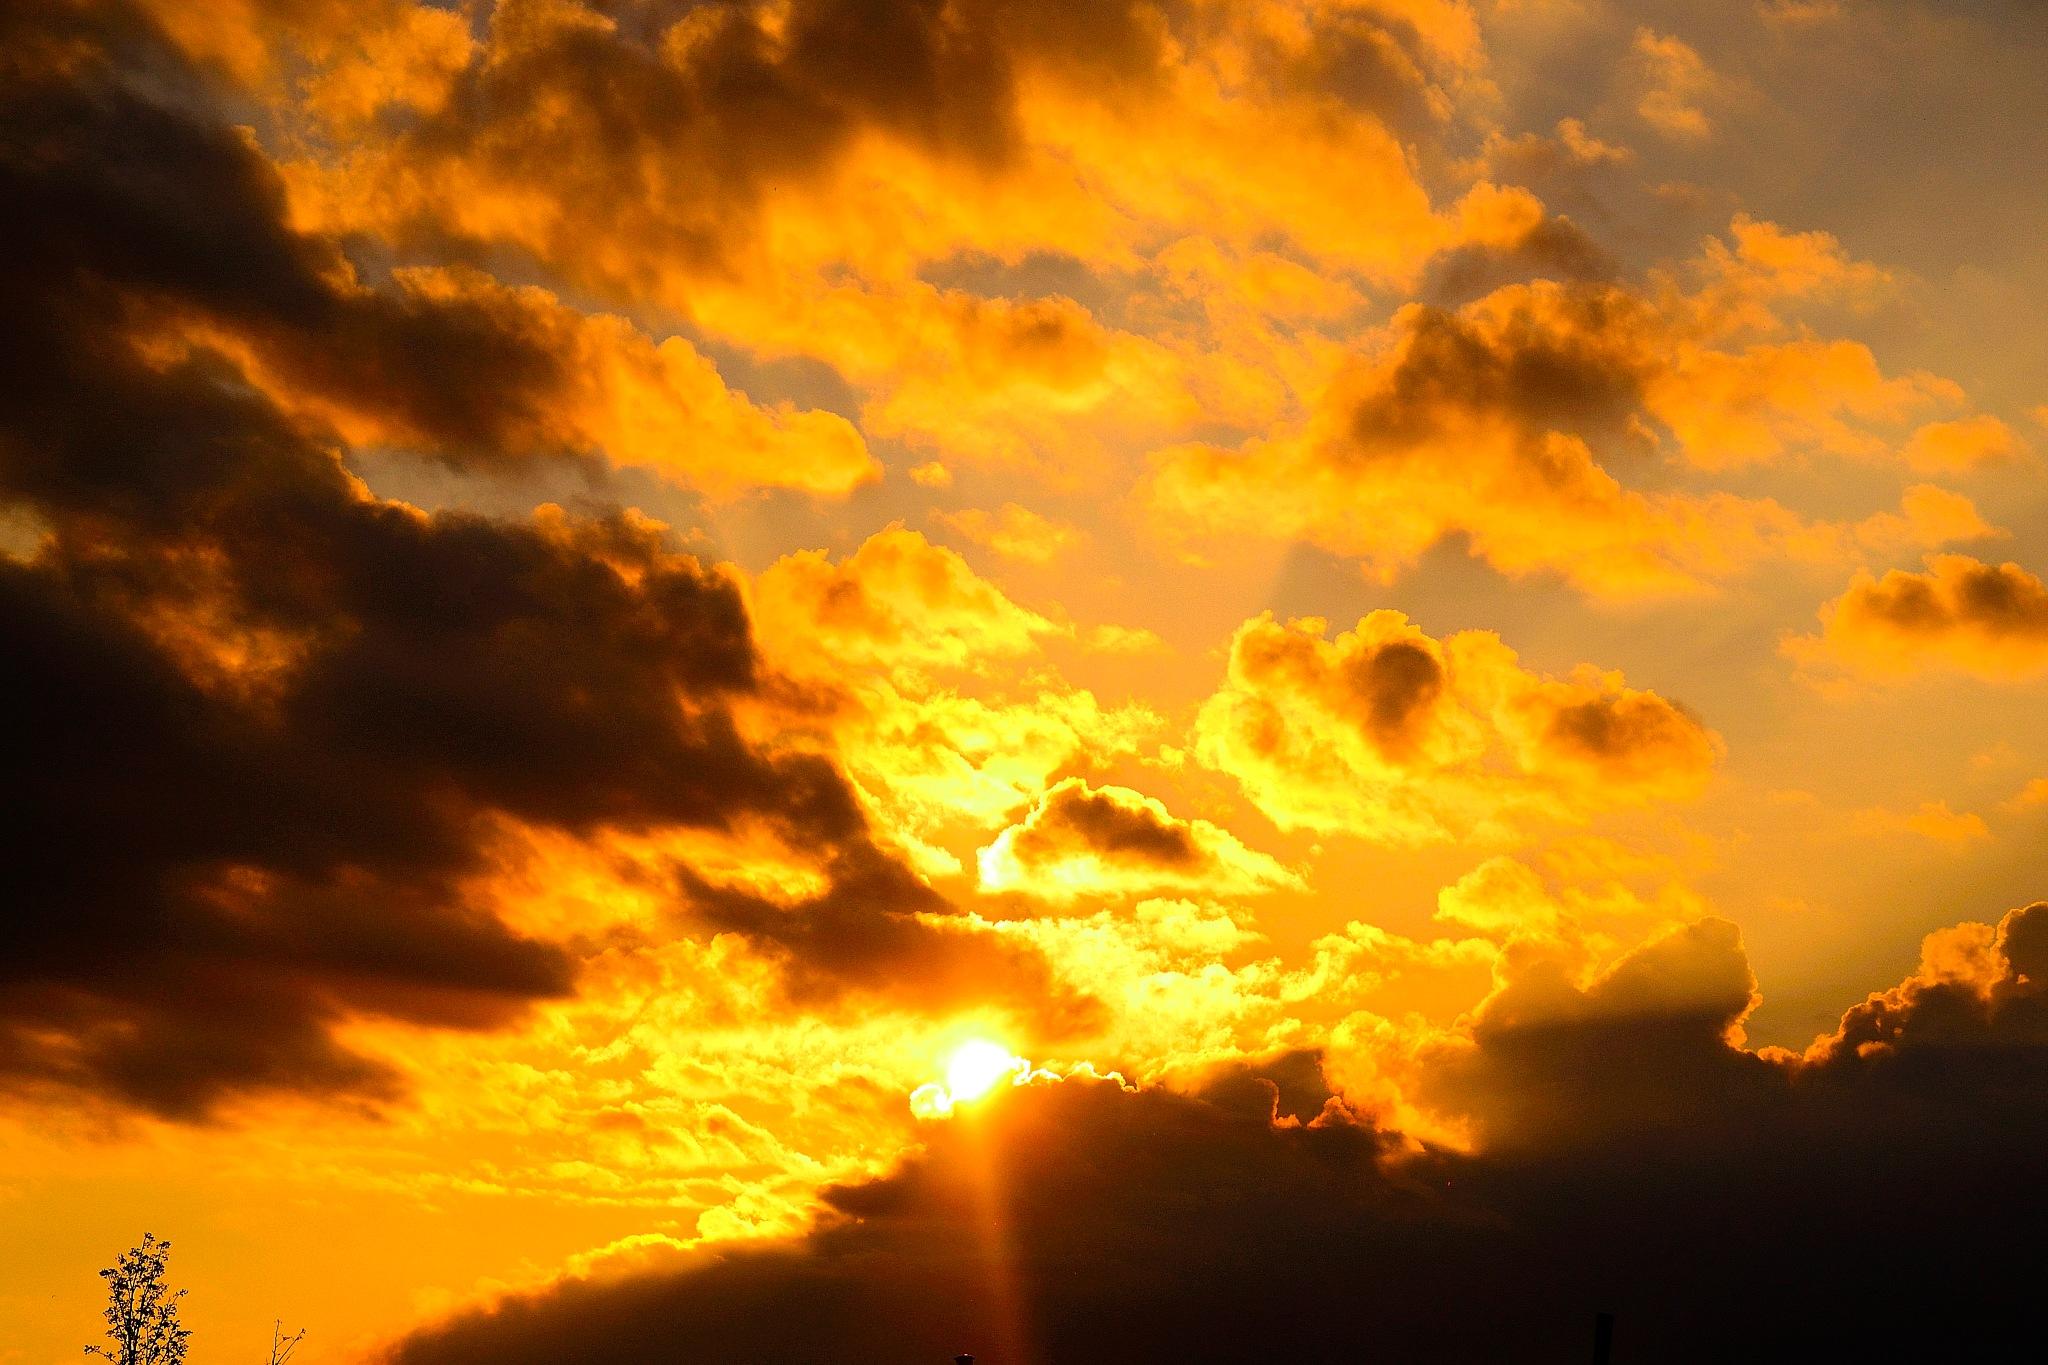 Sunlight  by tamasergy